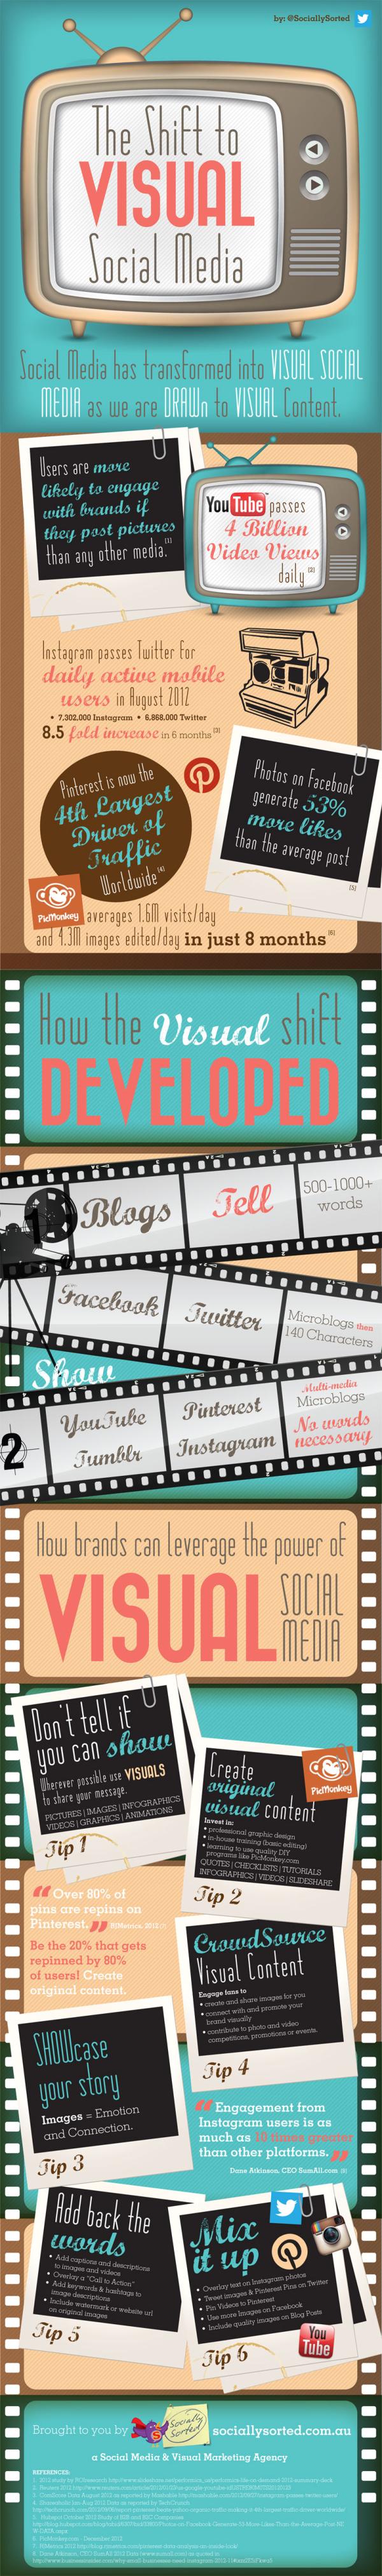 shift to visual social media resized 600